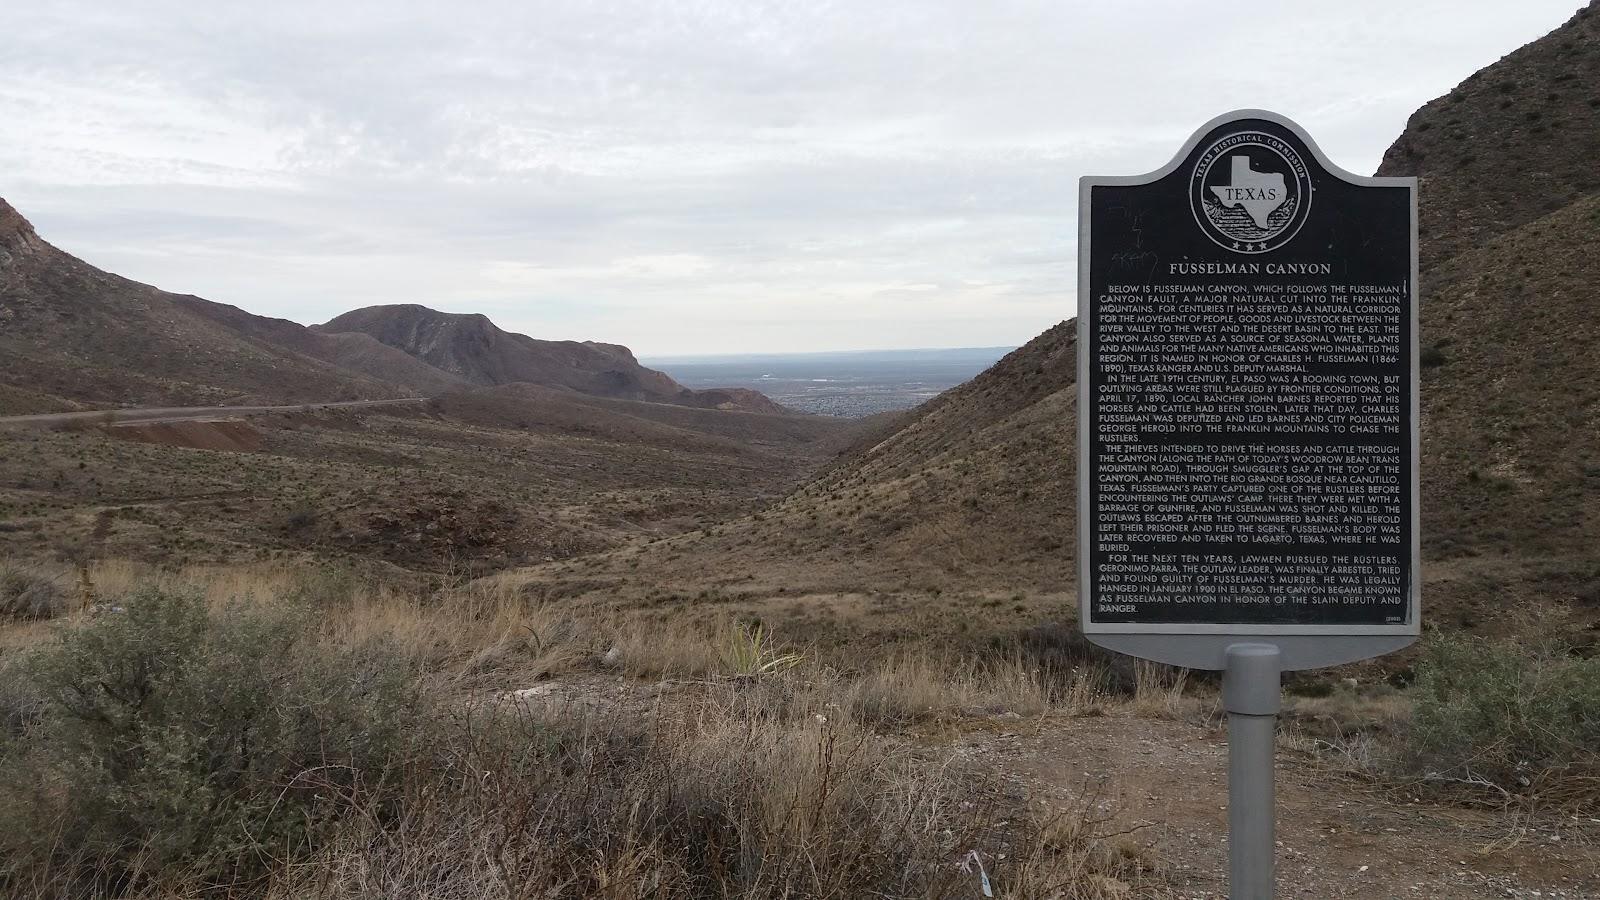 Bike climb Smugglers Pass East - Transmountain Drive - Fusselman canyon historical marker